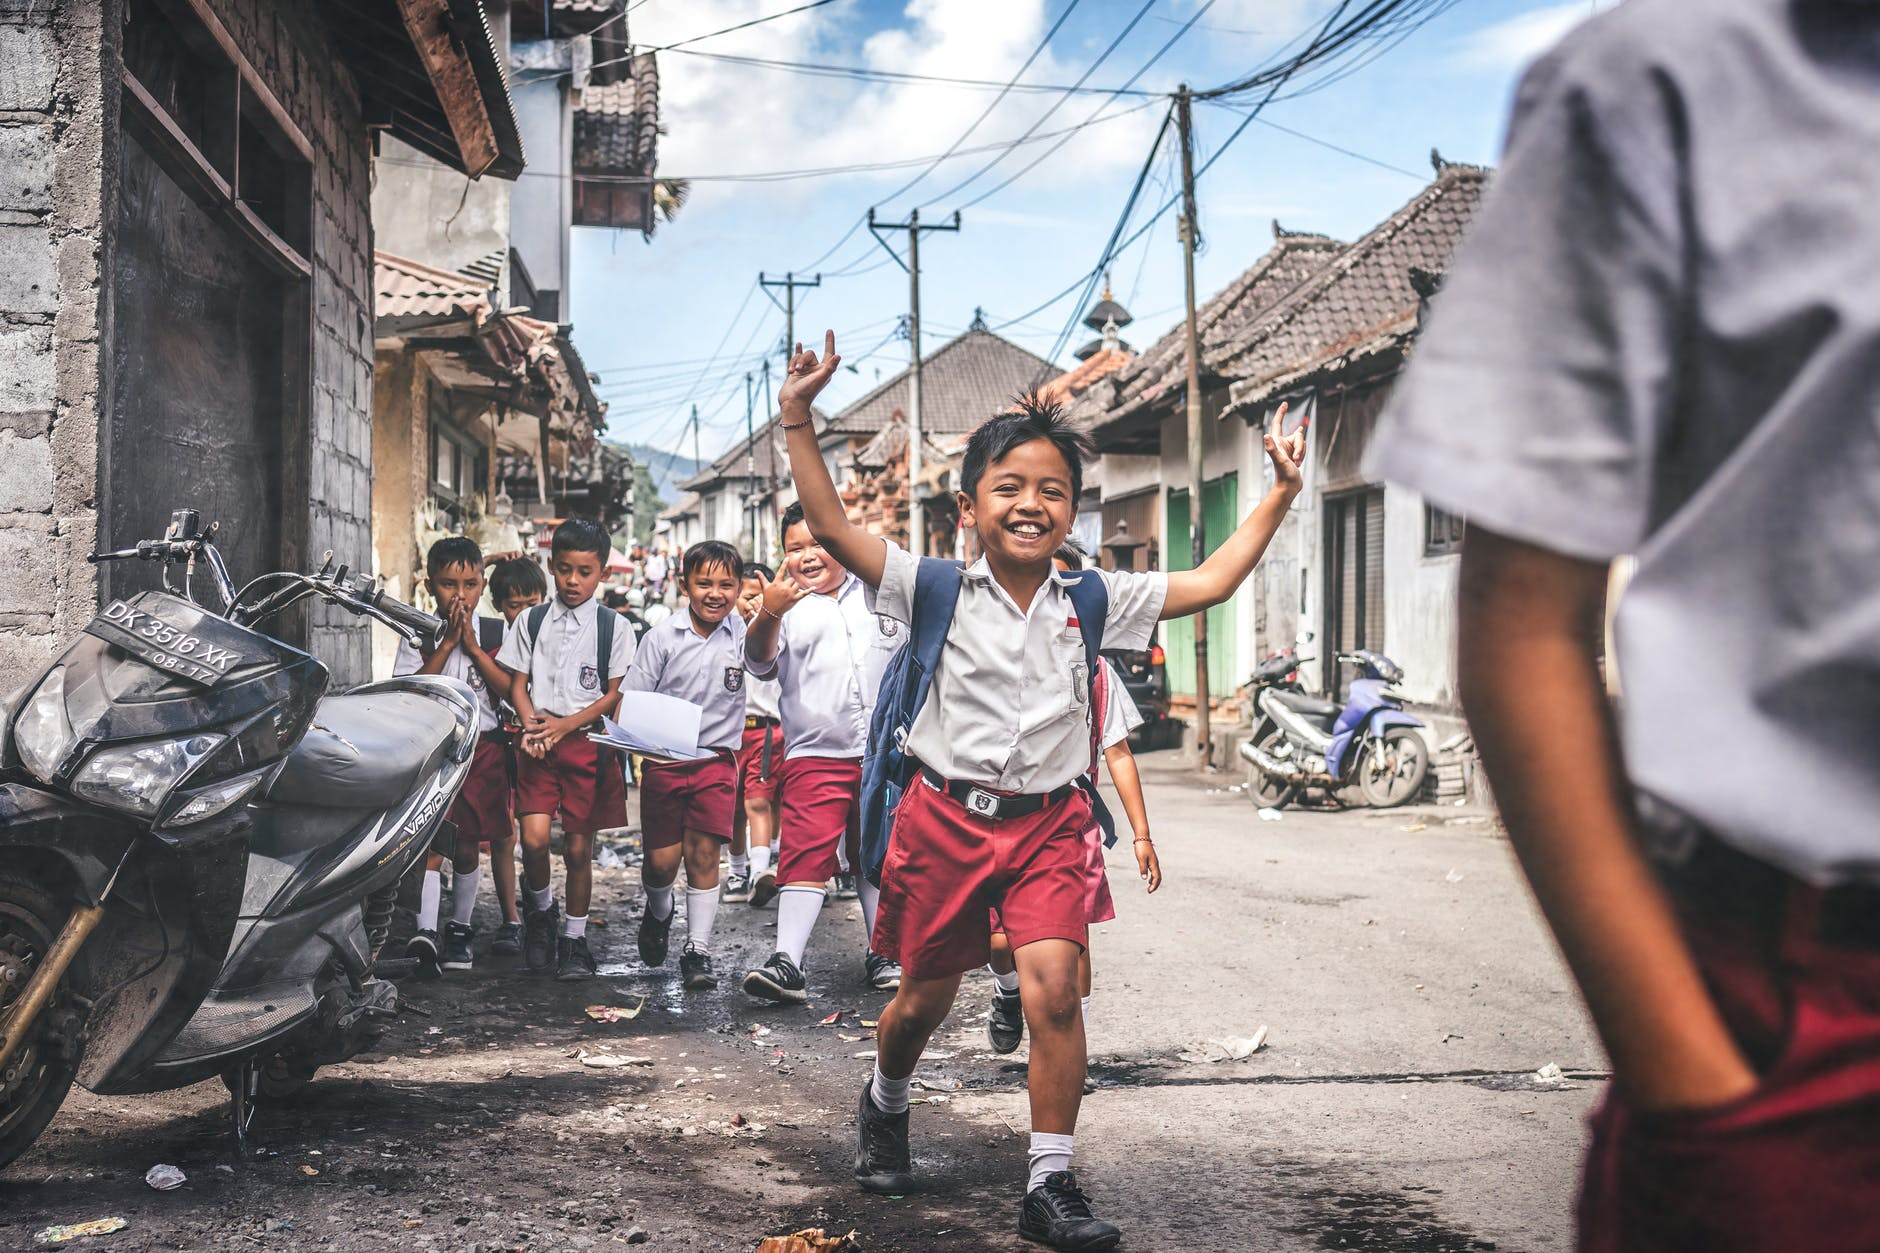 activity asian people boys children